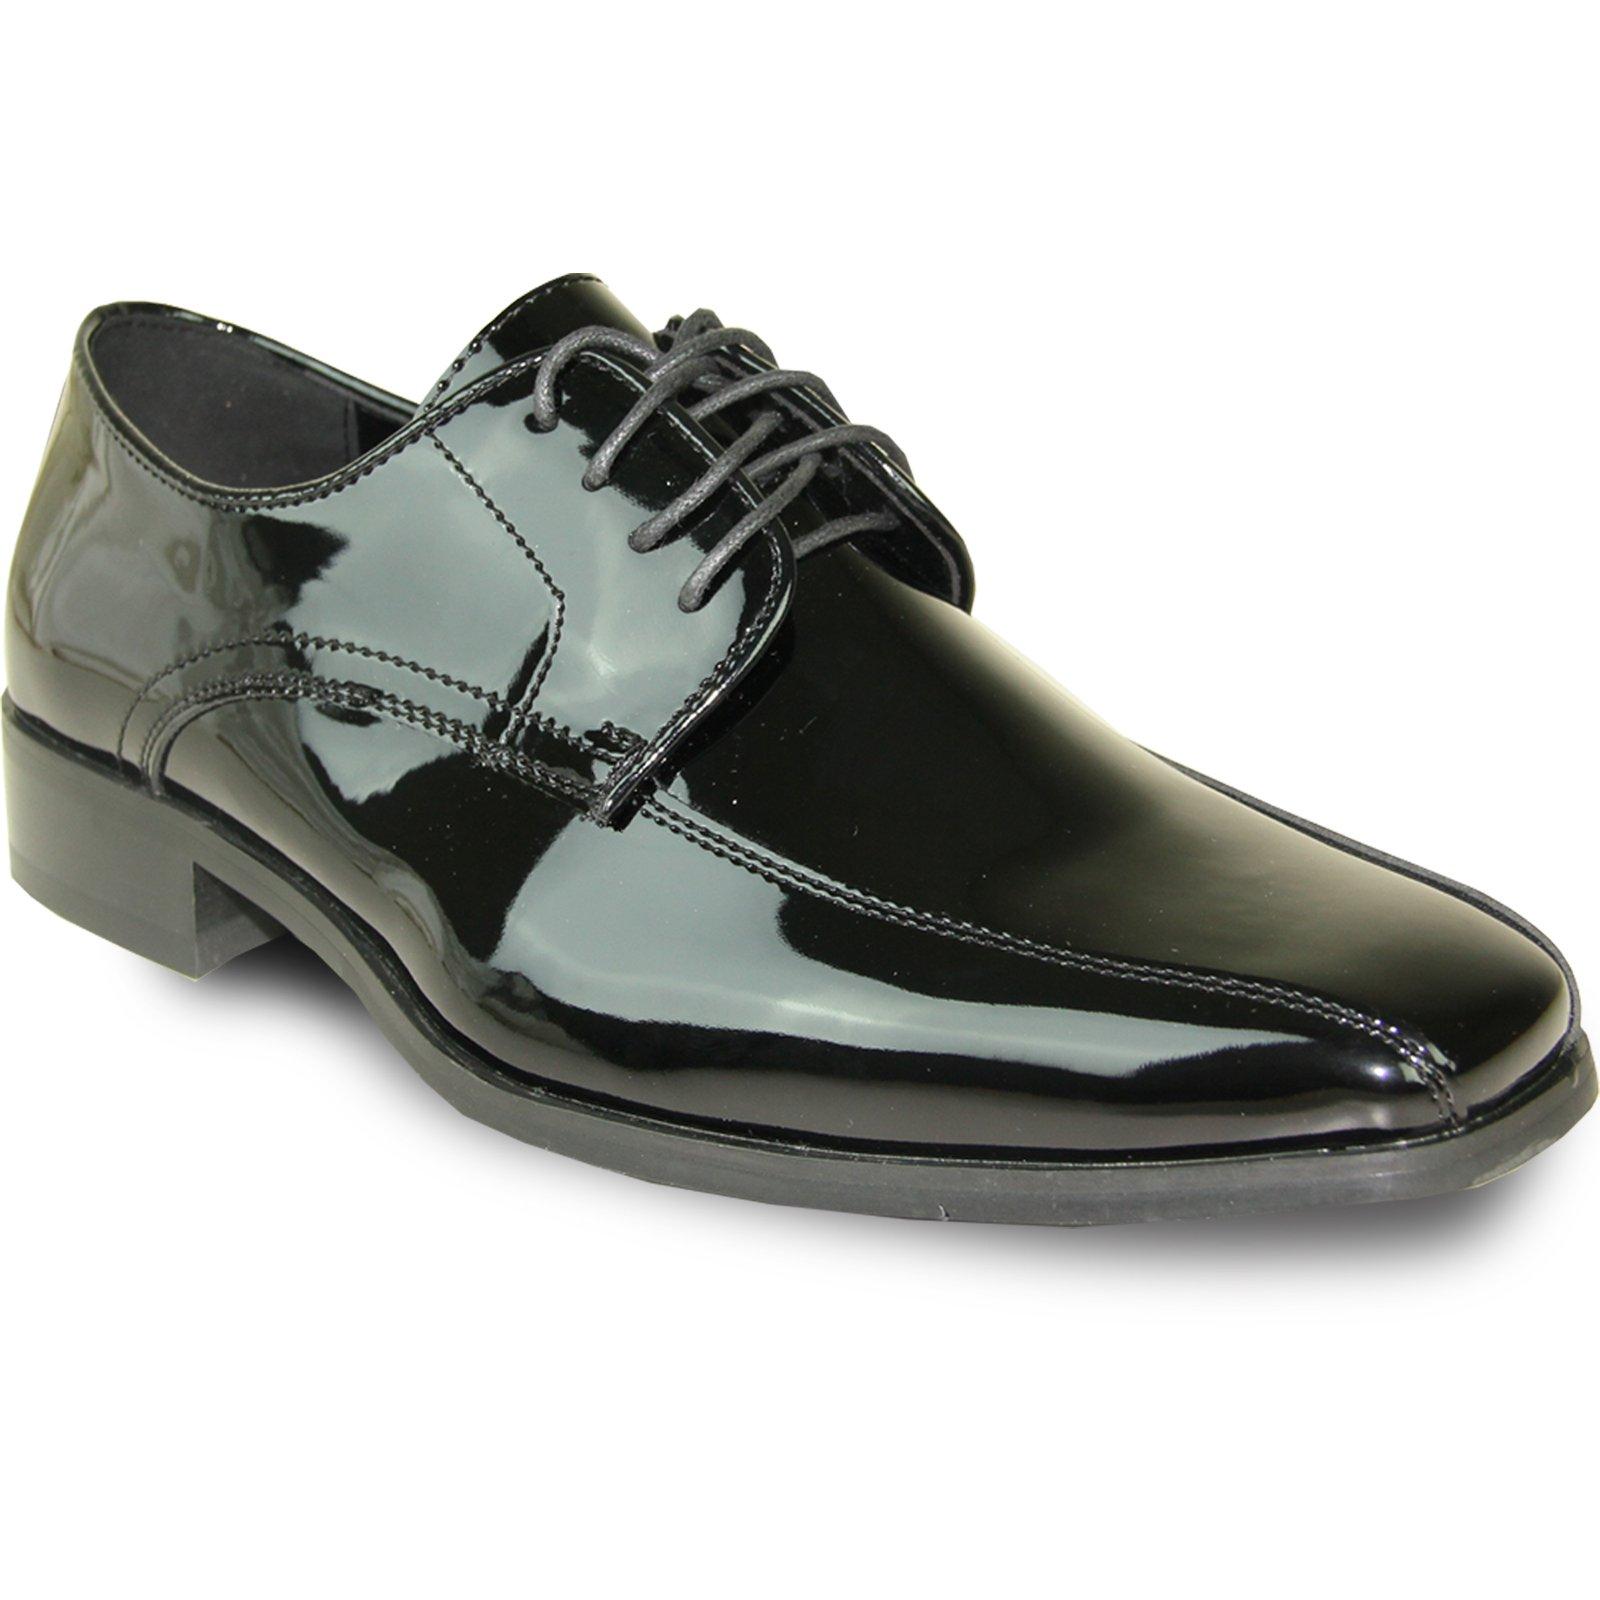 VANGELO Men Tuxedo Shoe TUX-5 Fashion Square Toe for Wedding & Formal Event